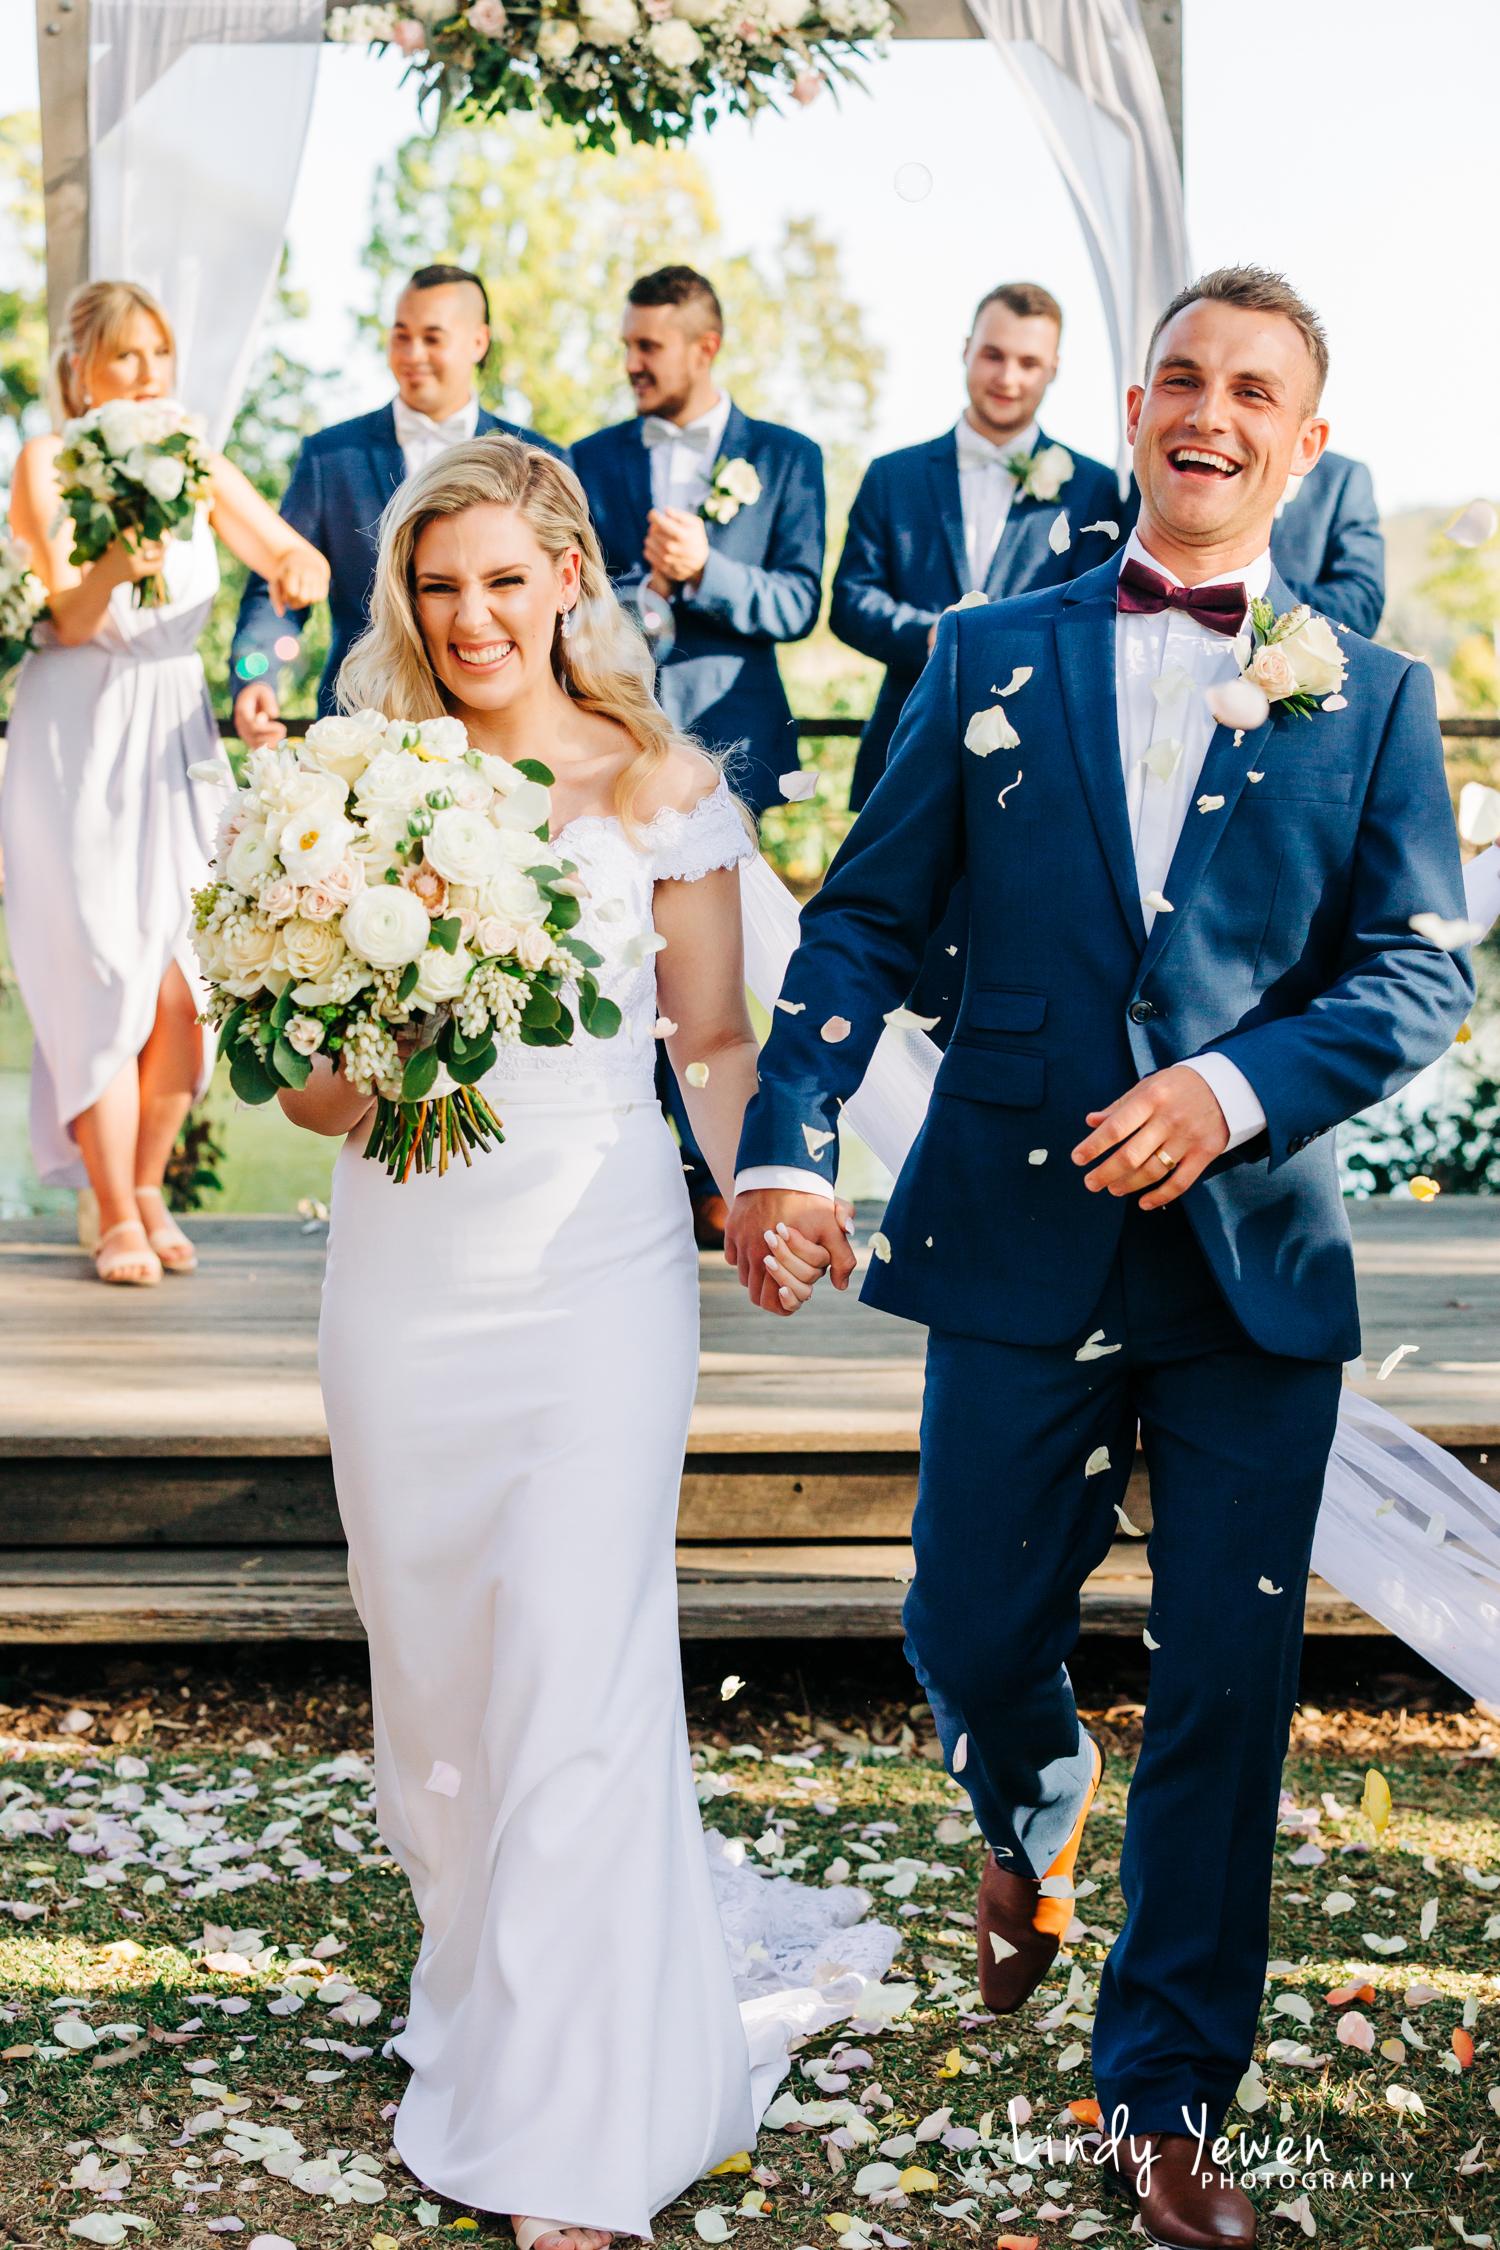 The Rocks Yandina Weddings Lindy Photography 248.jpg